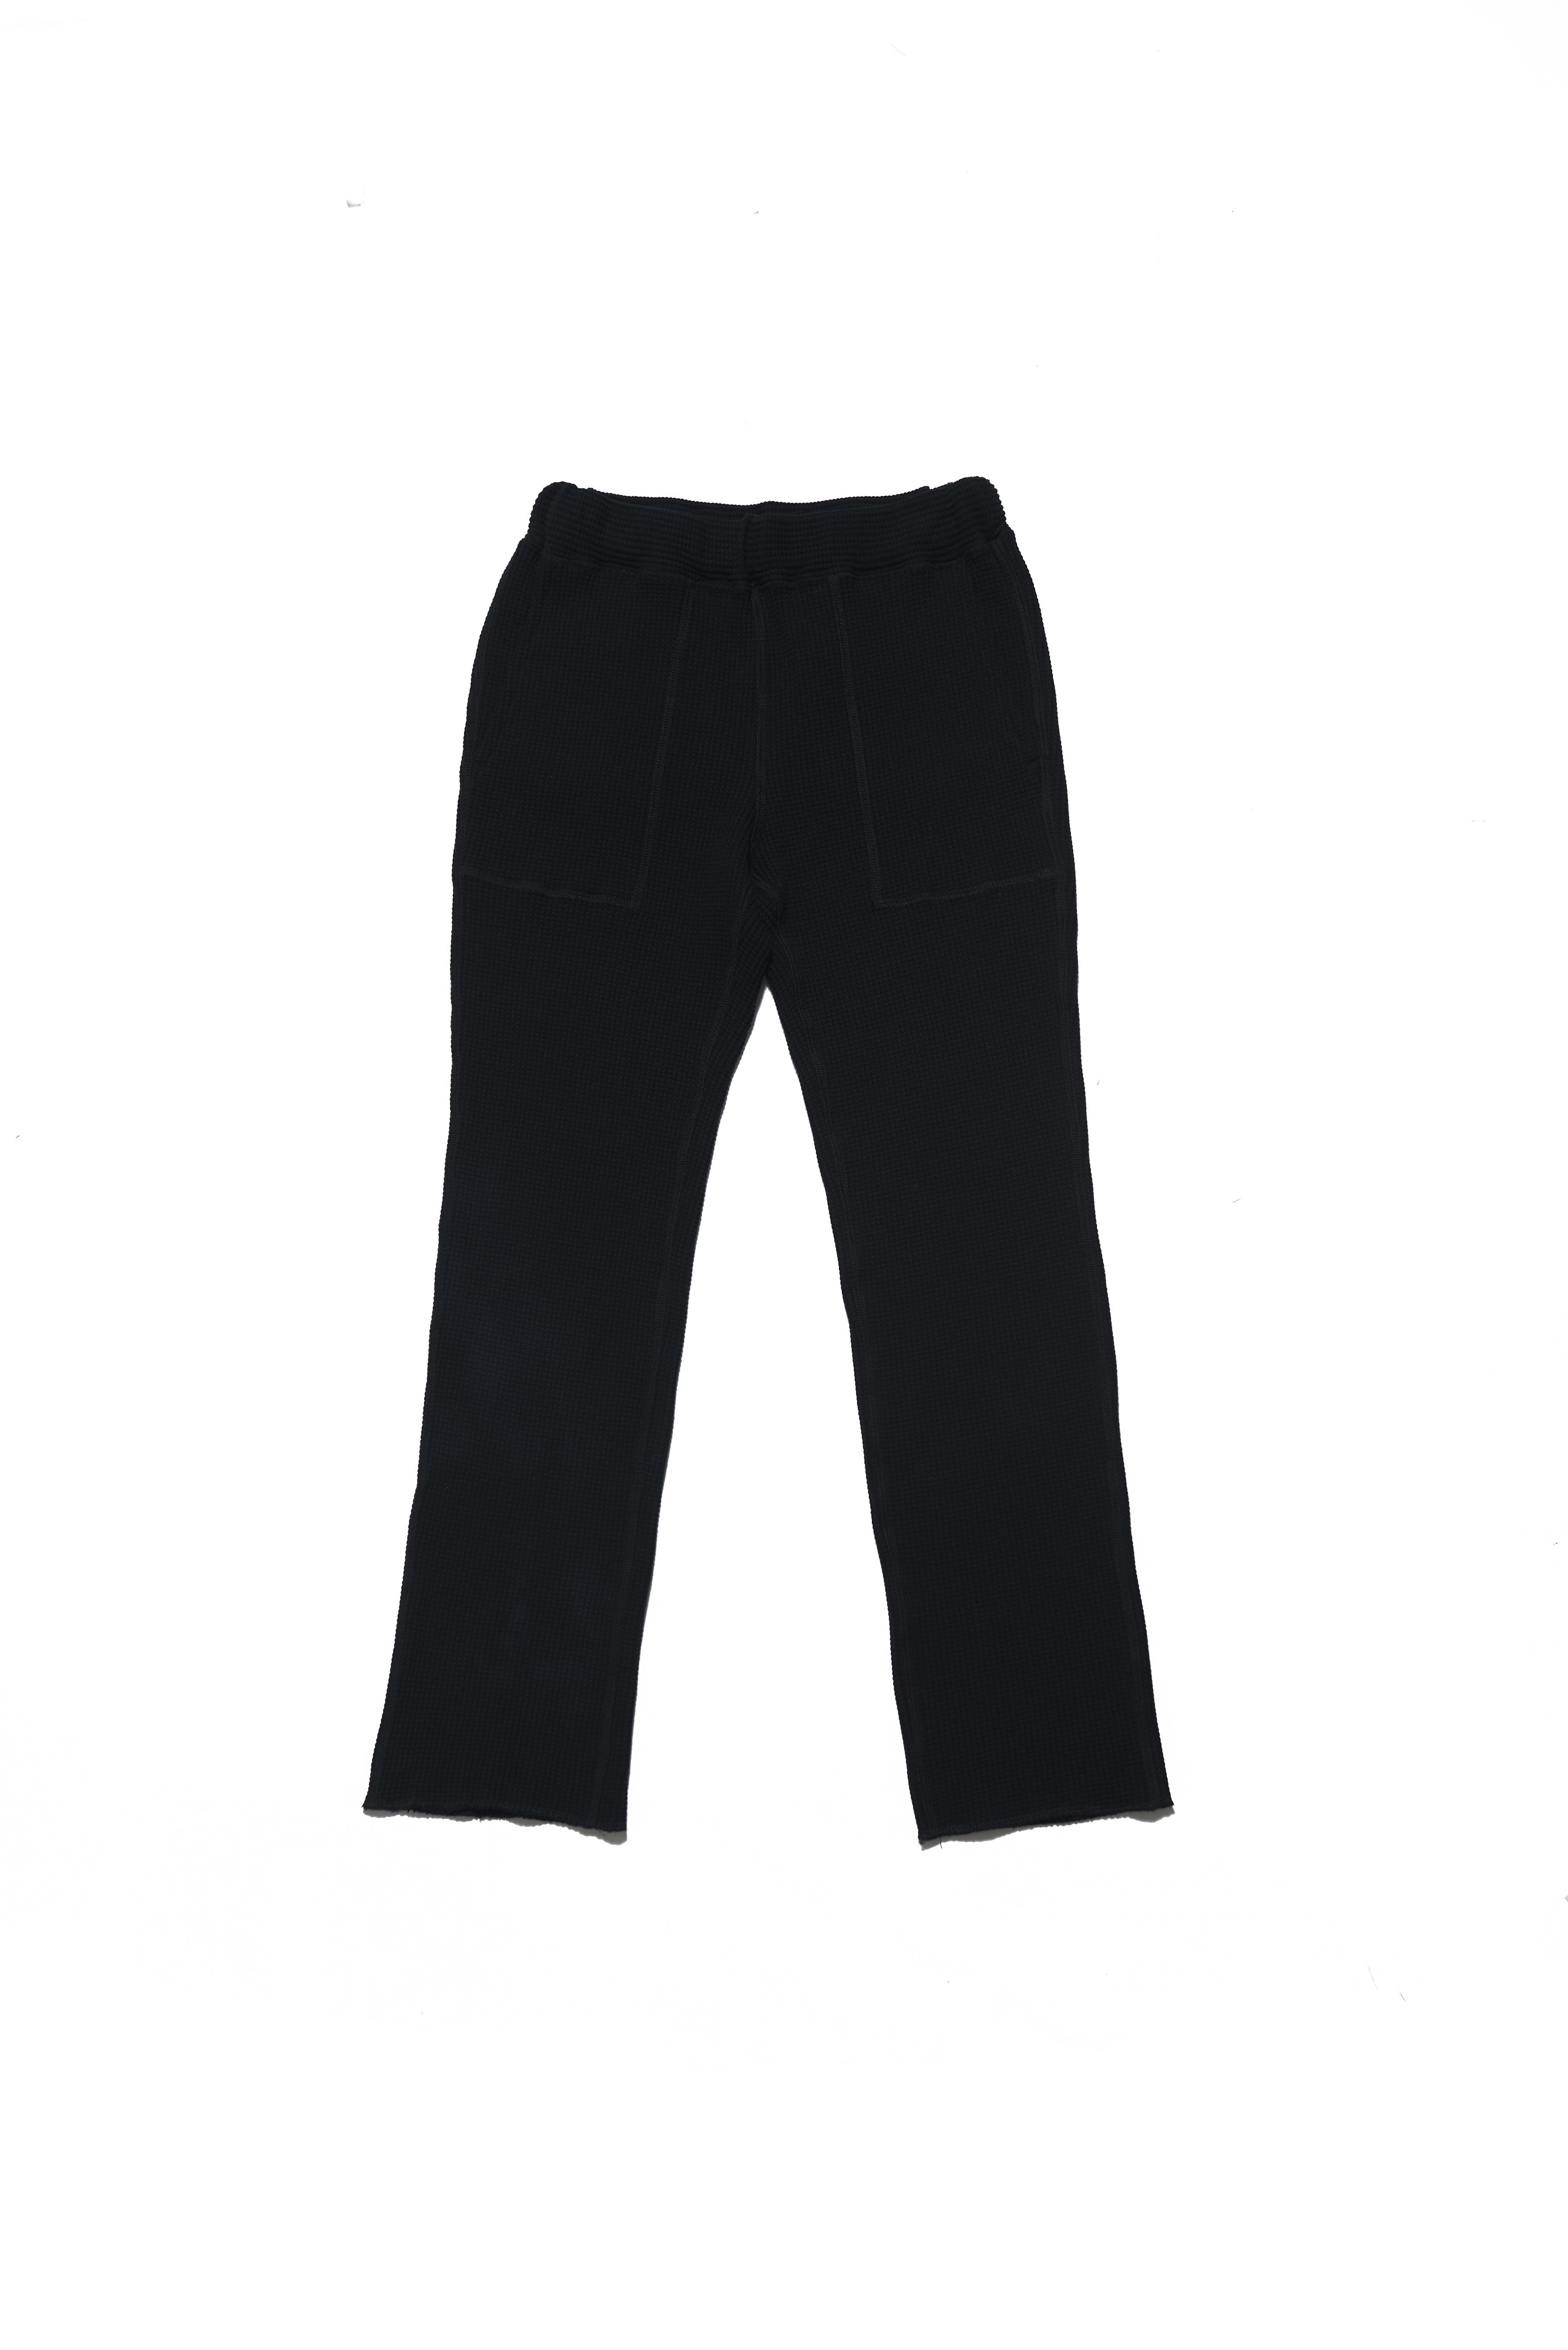 THERMAL PANTS WOMEN'S -  BLACK